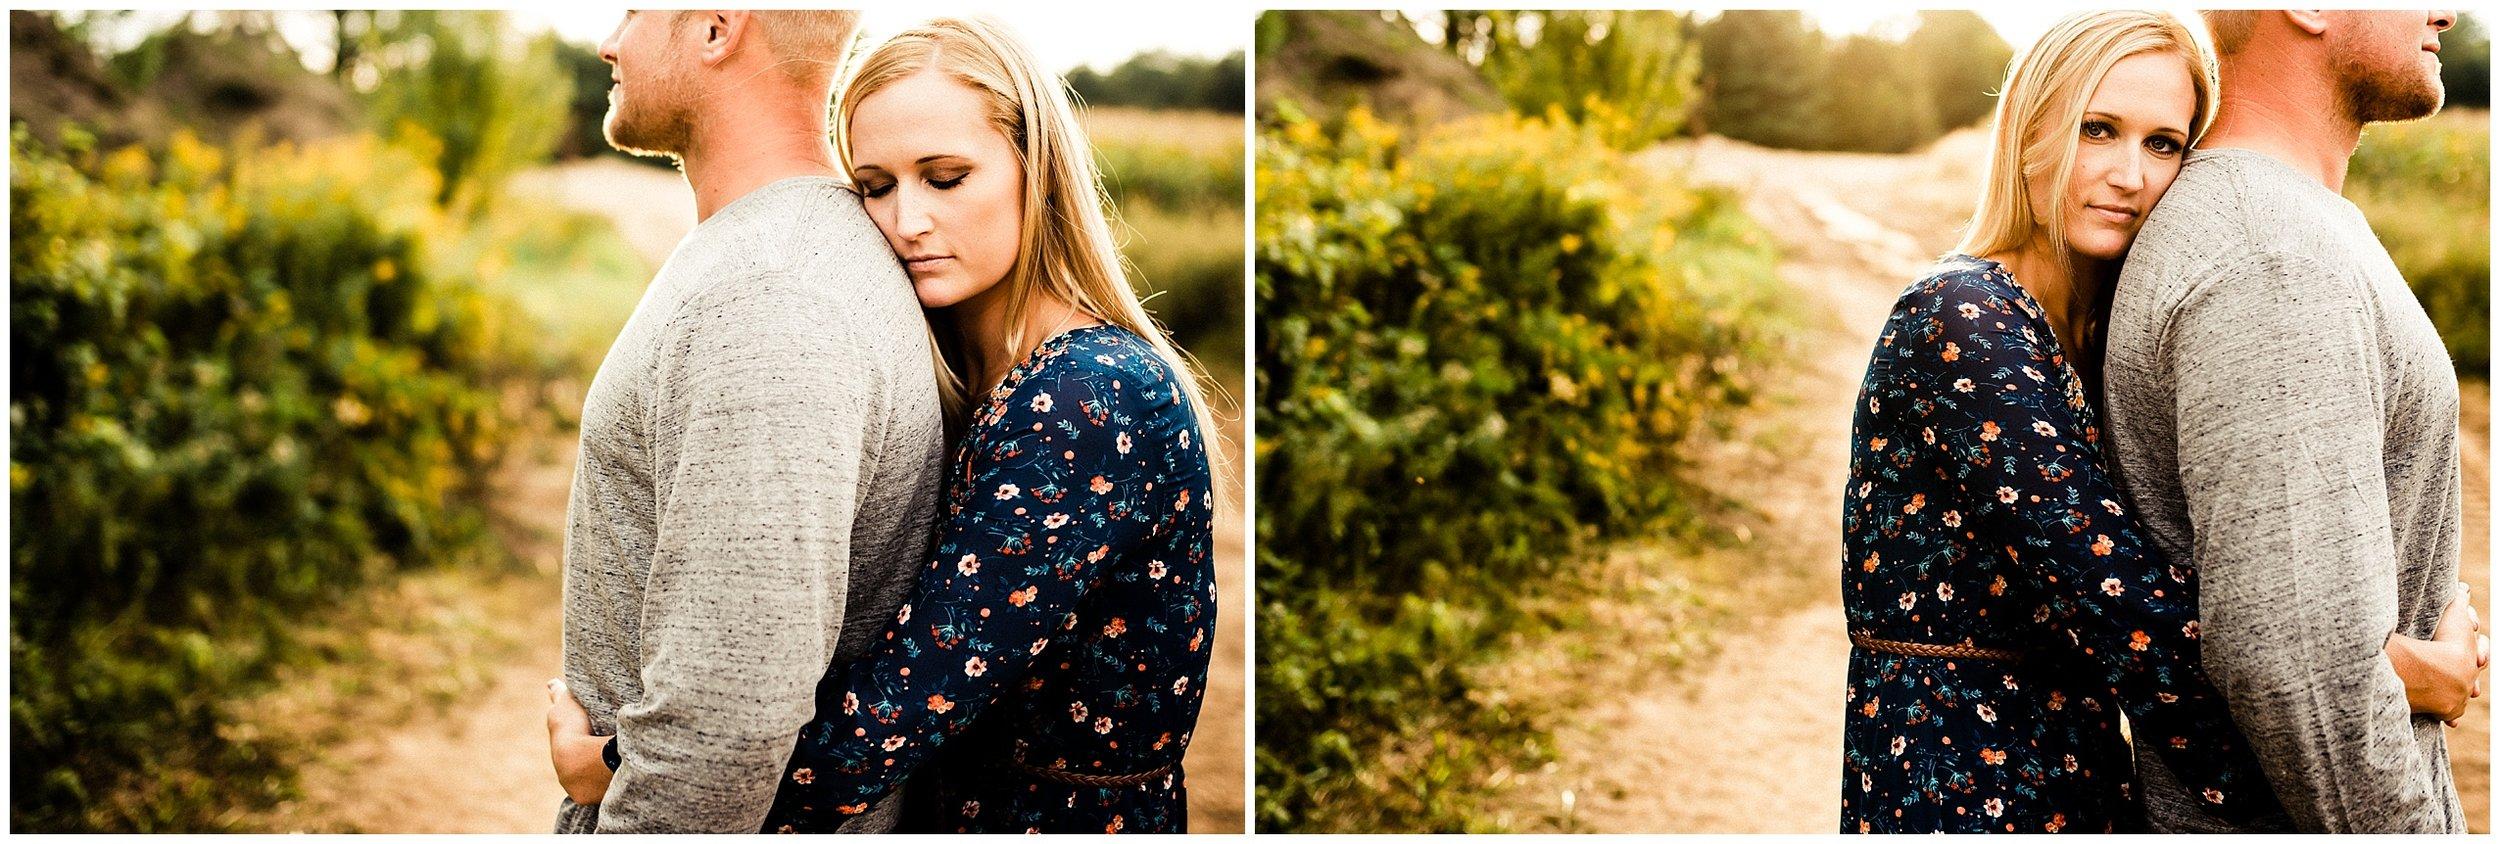 Ben + Haily | Engaged #kyleepaigephotography_1138.jpg